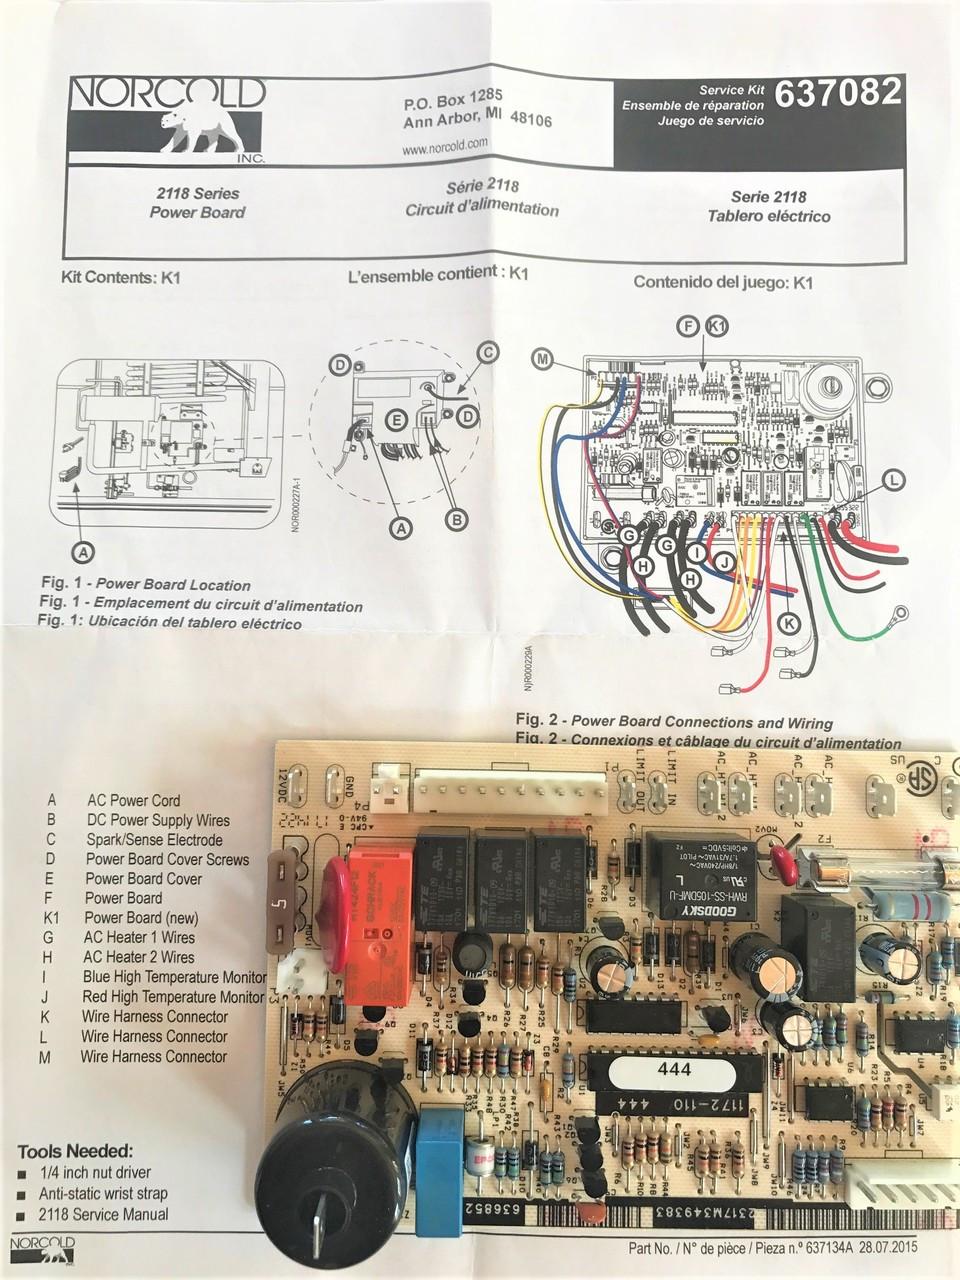 IMG_0059_2__66296.1504279223.1280.1280?c=2 norcold model n621 rv refrigerator wiring diagram norcold 1200 norcold 1200 wiring diagram at mr168.co